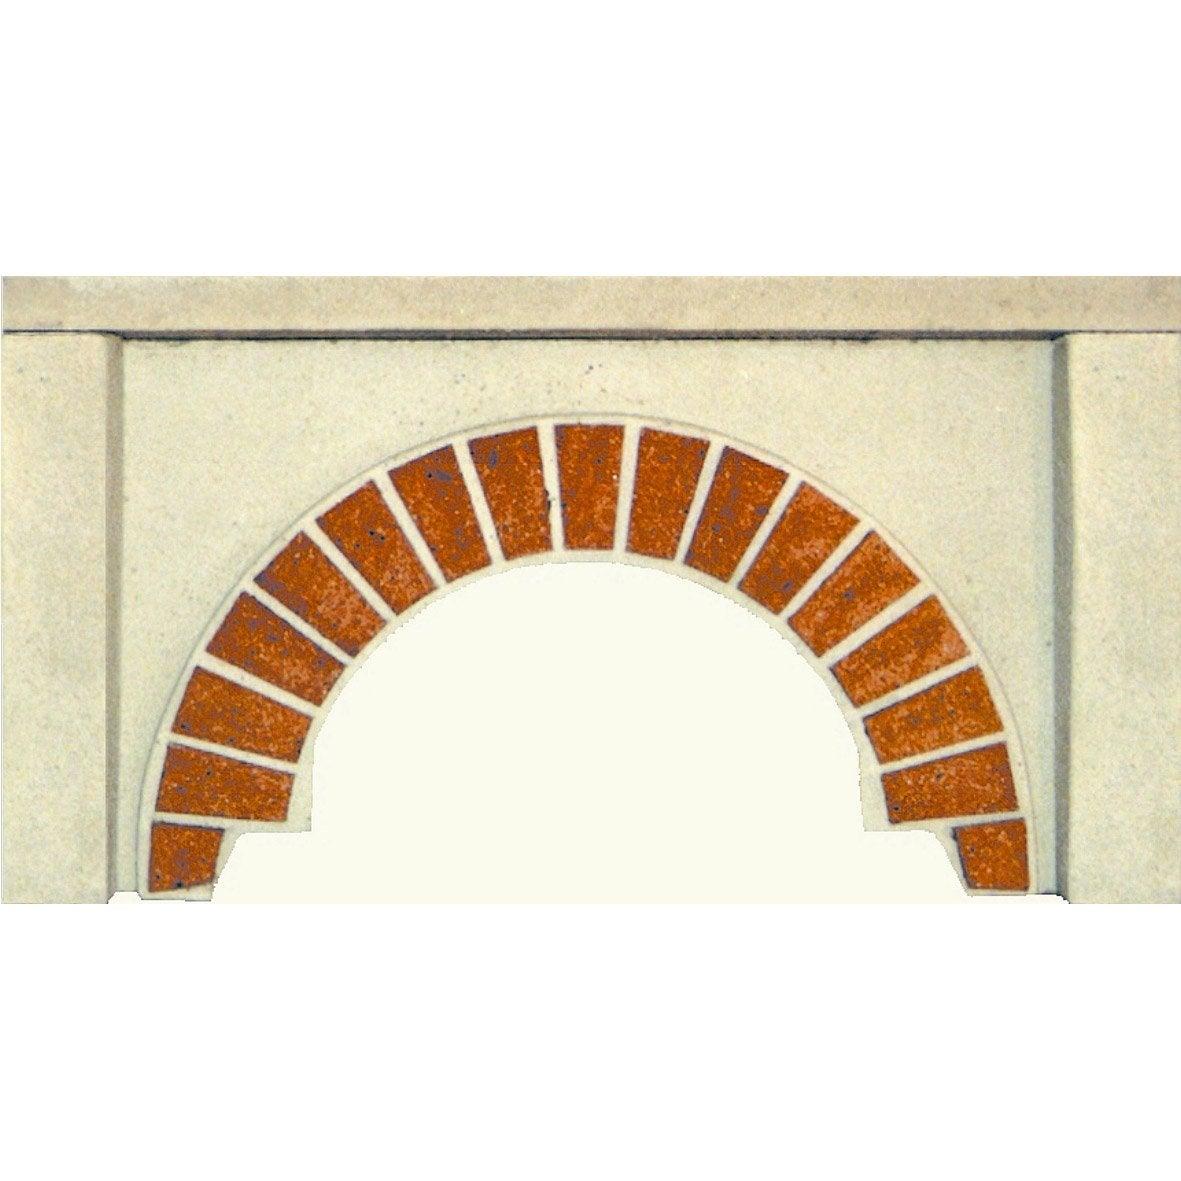 Fa ade en pierre reconstitu e blanc et terre cuite arcade - Banc en pierre leroy merlin ...